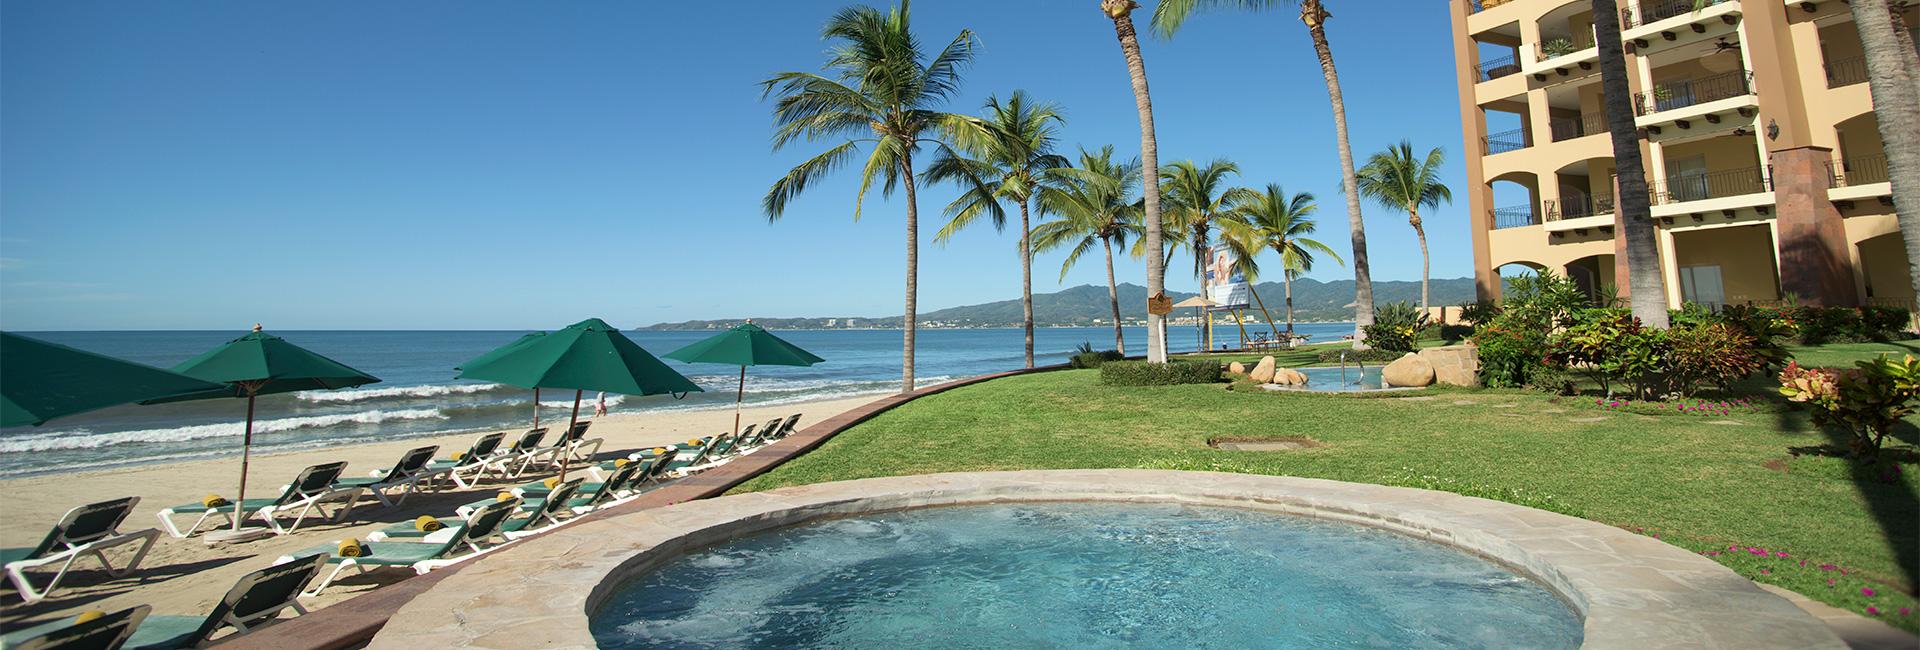 Villa La Estancia Riviera Nayarit Pool X